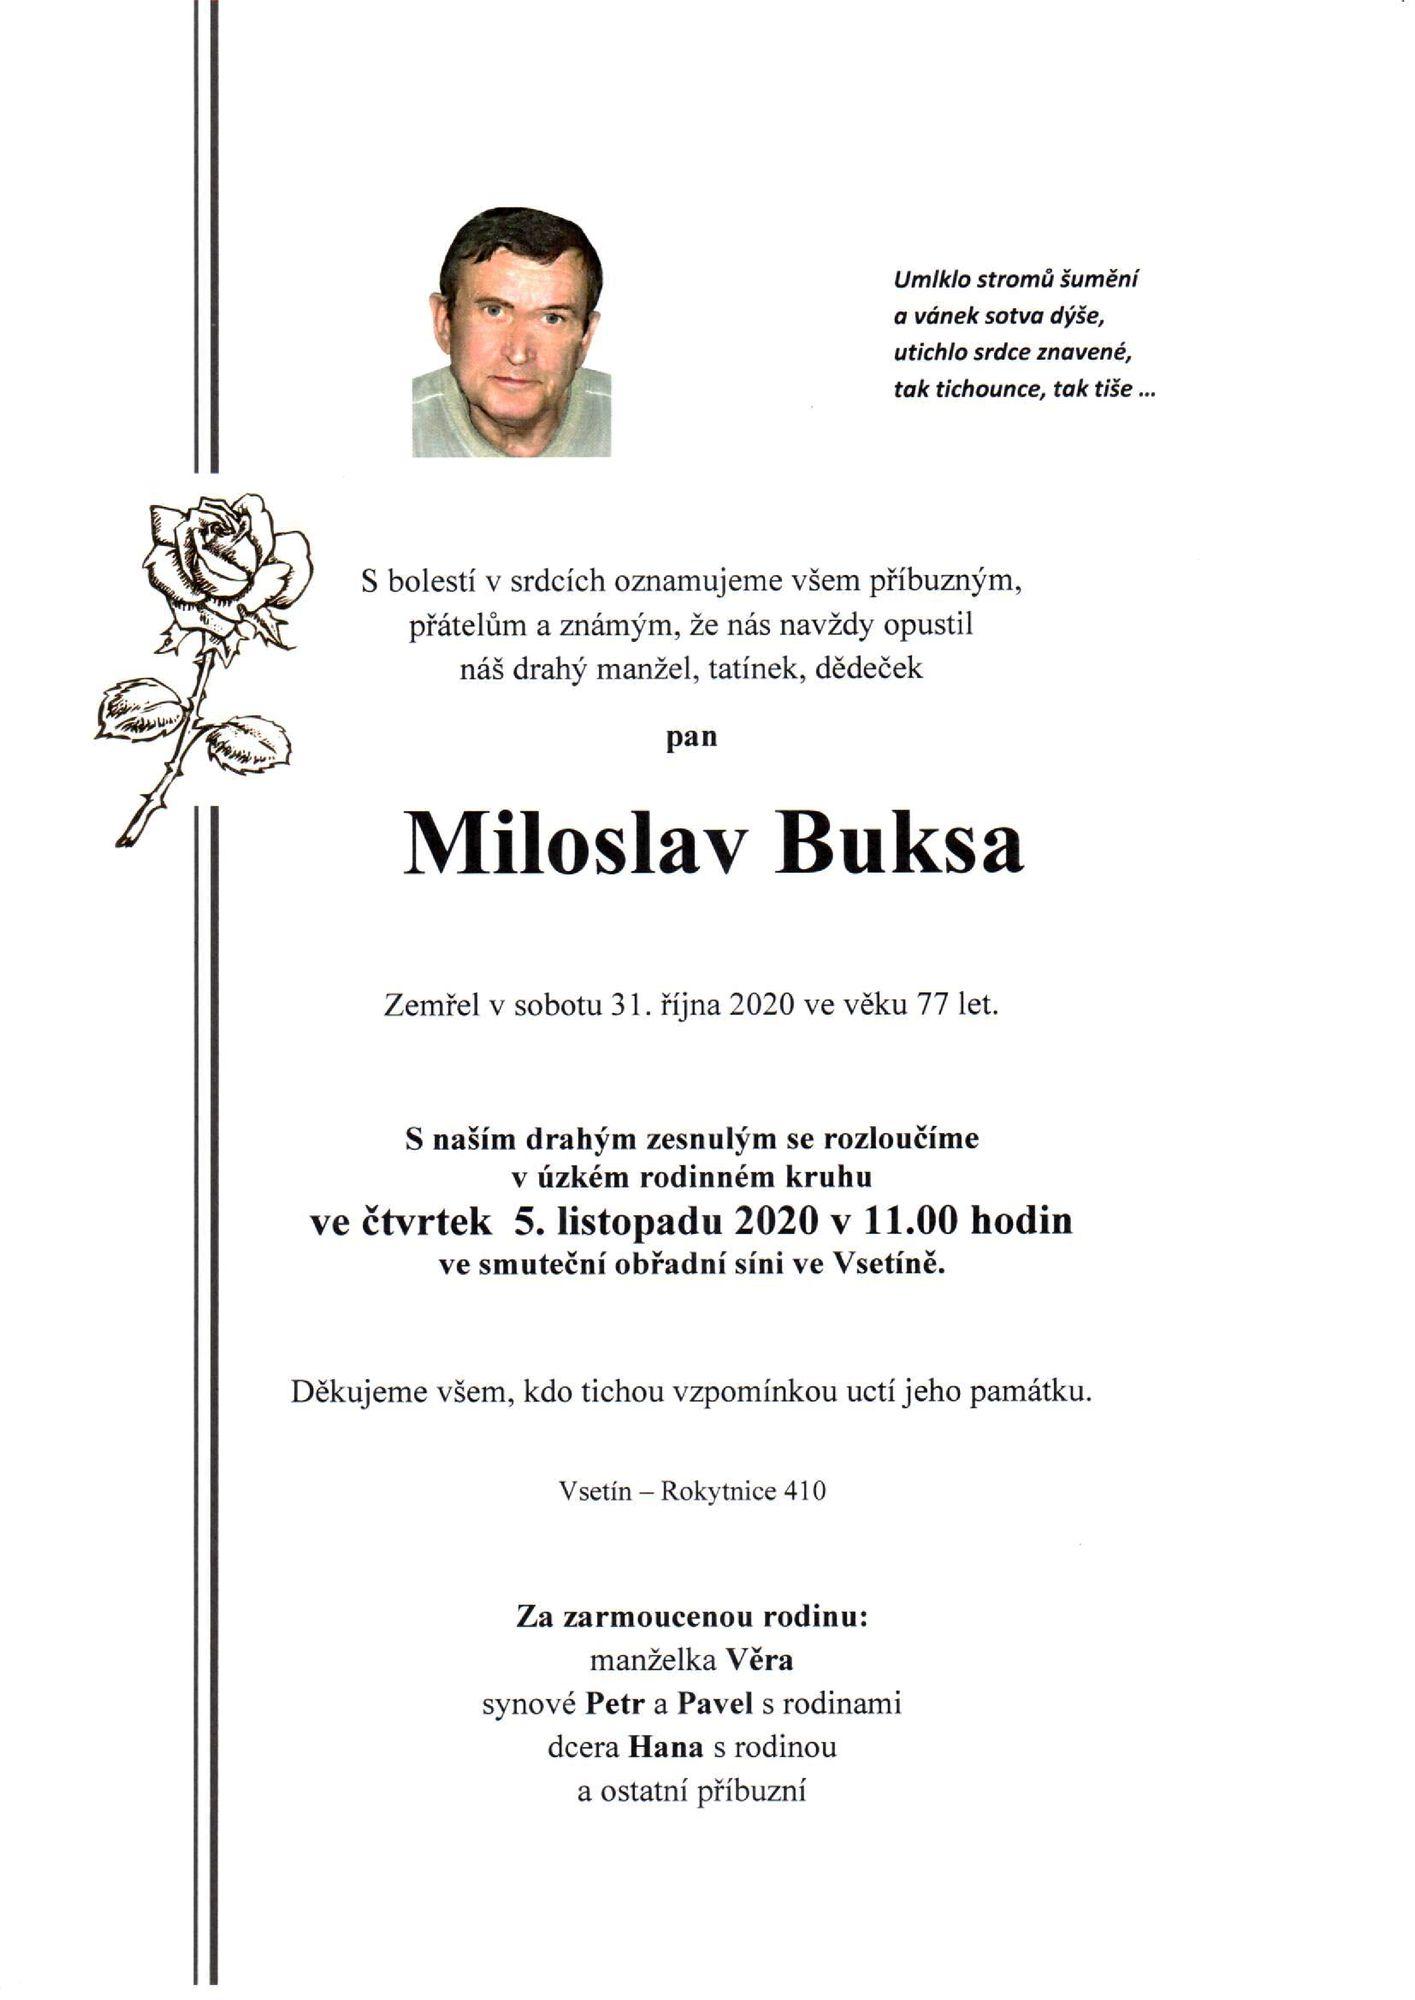 Miloslav Buksa